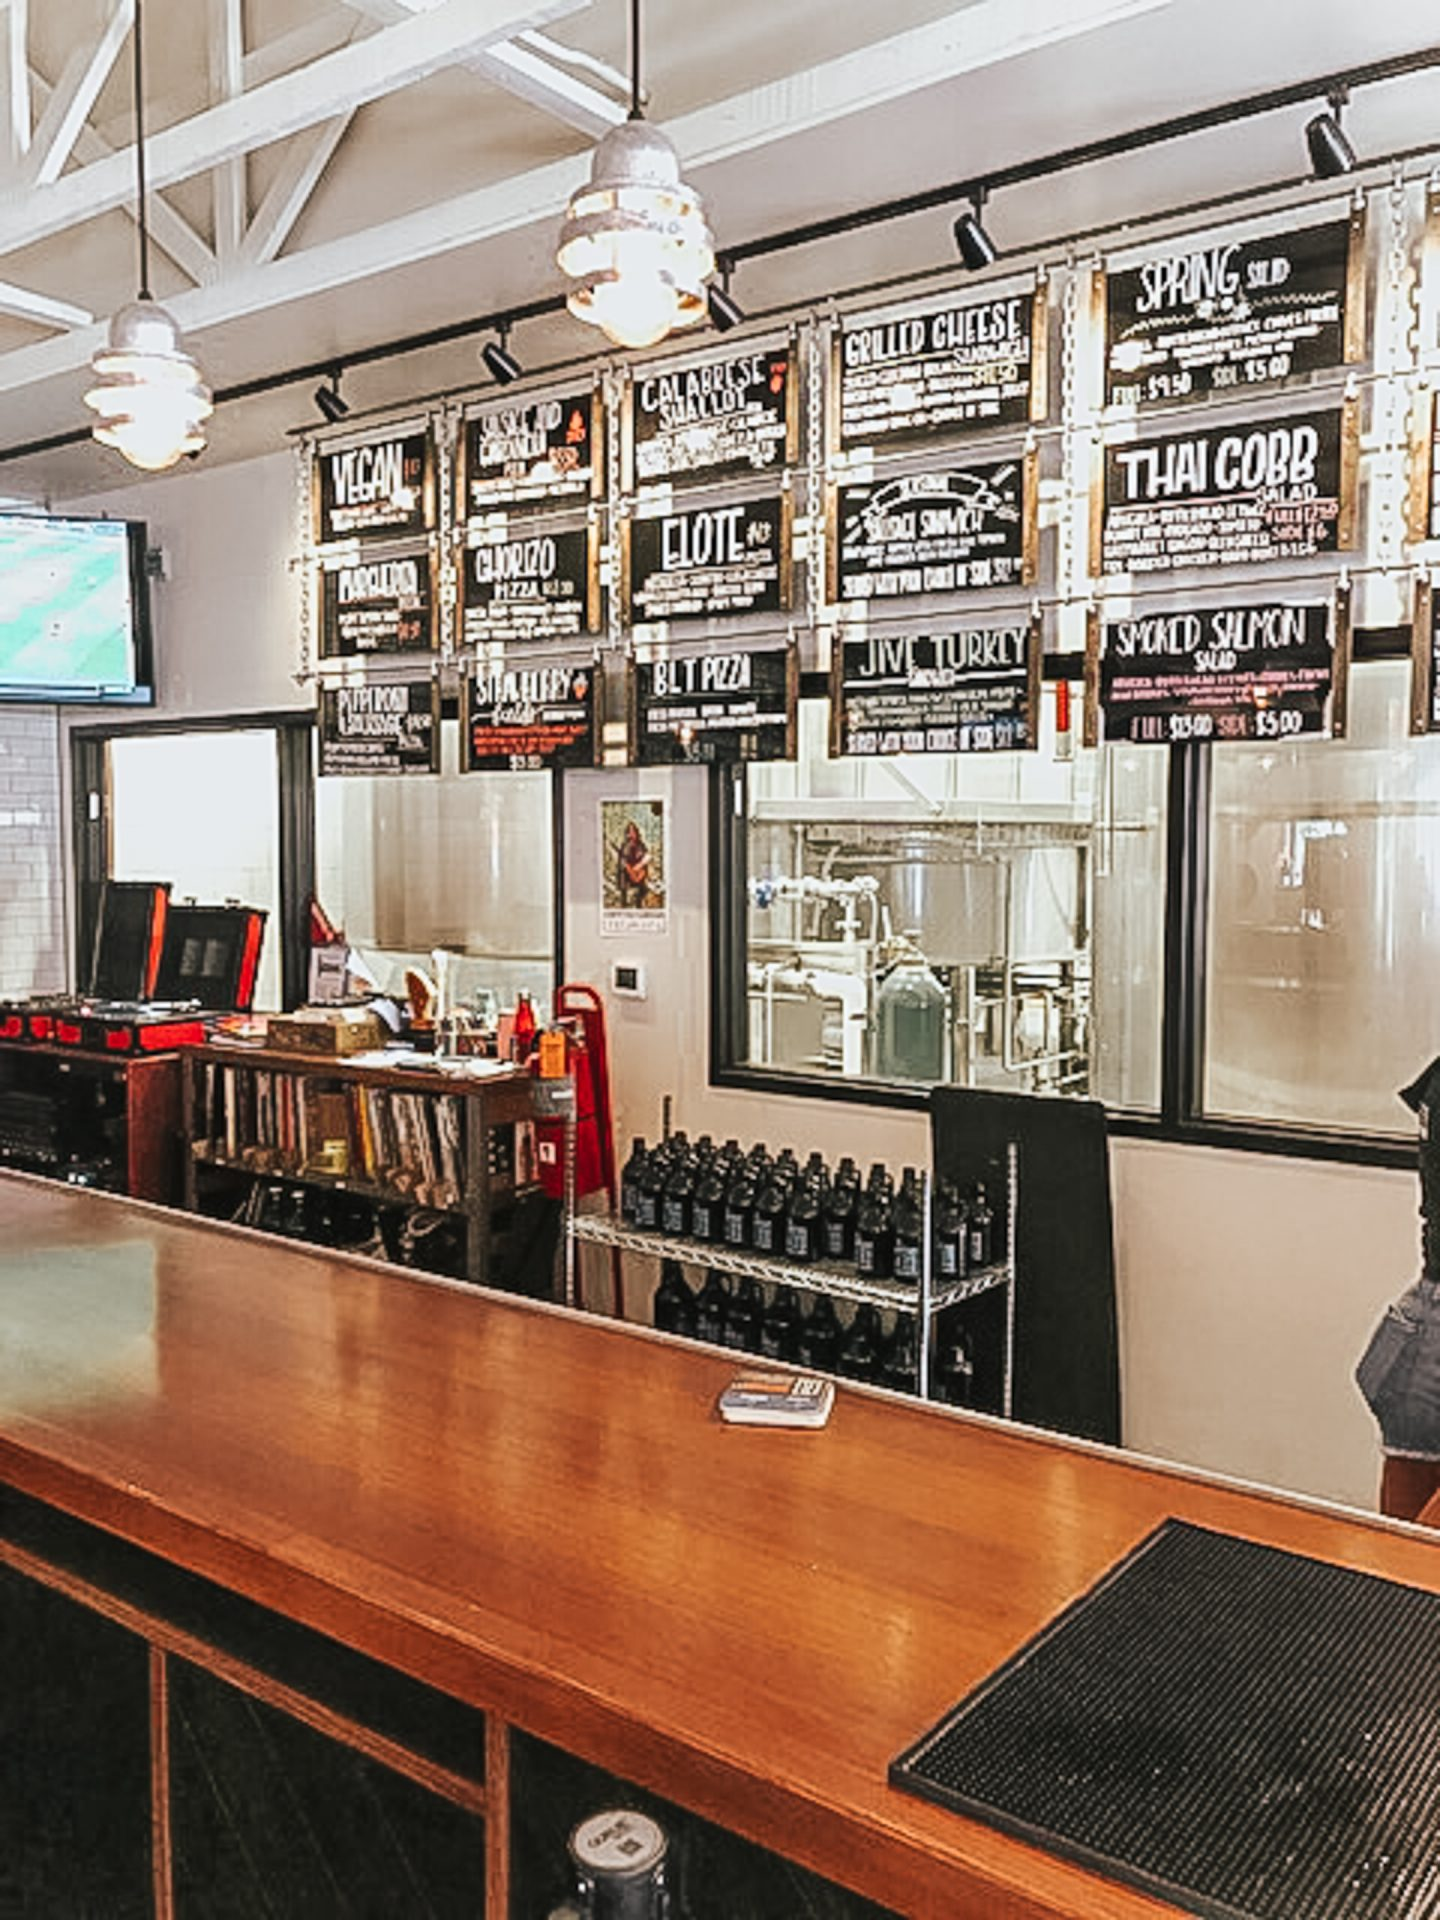 planning a day trip to western michigan, Haymarket Brewery